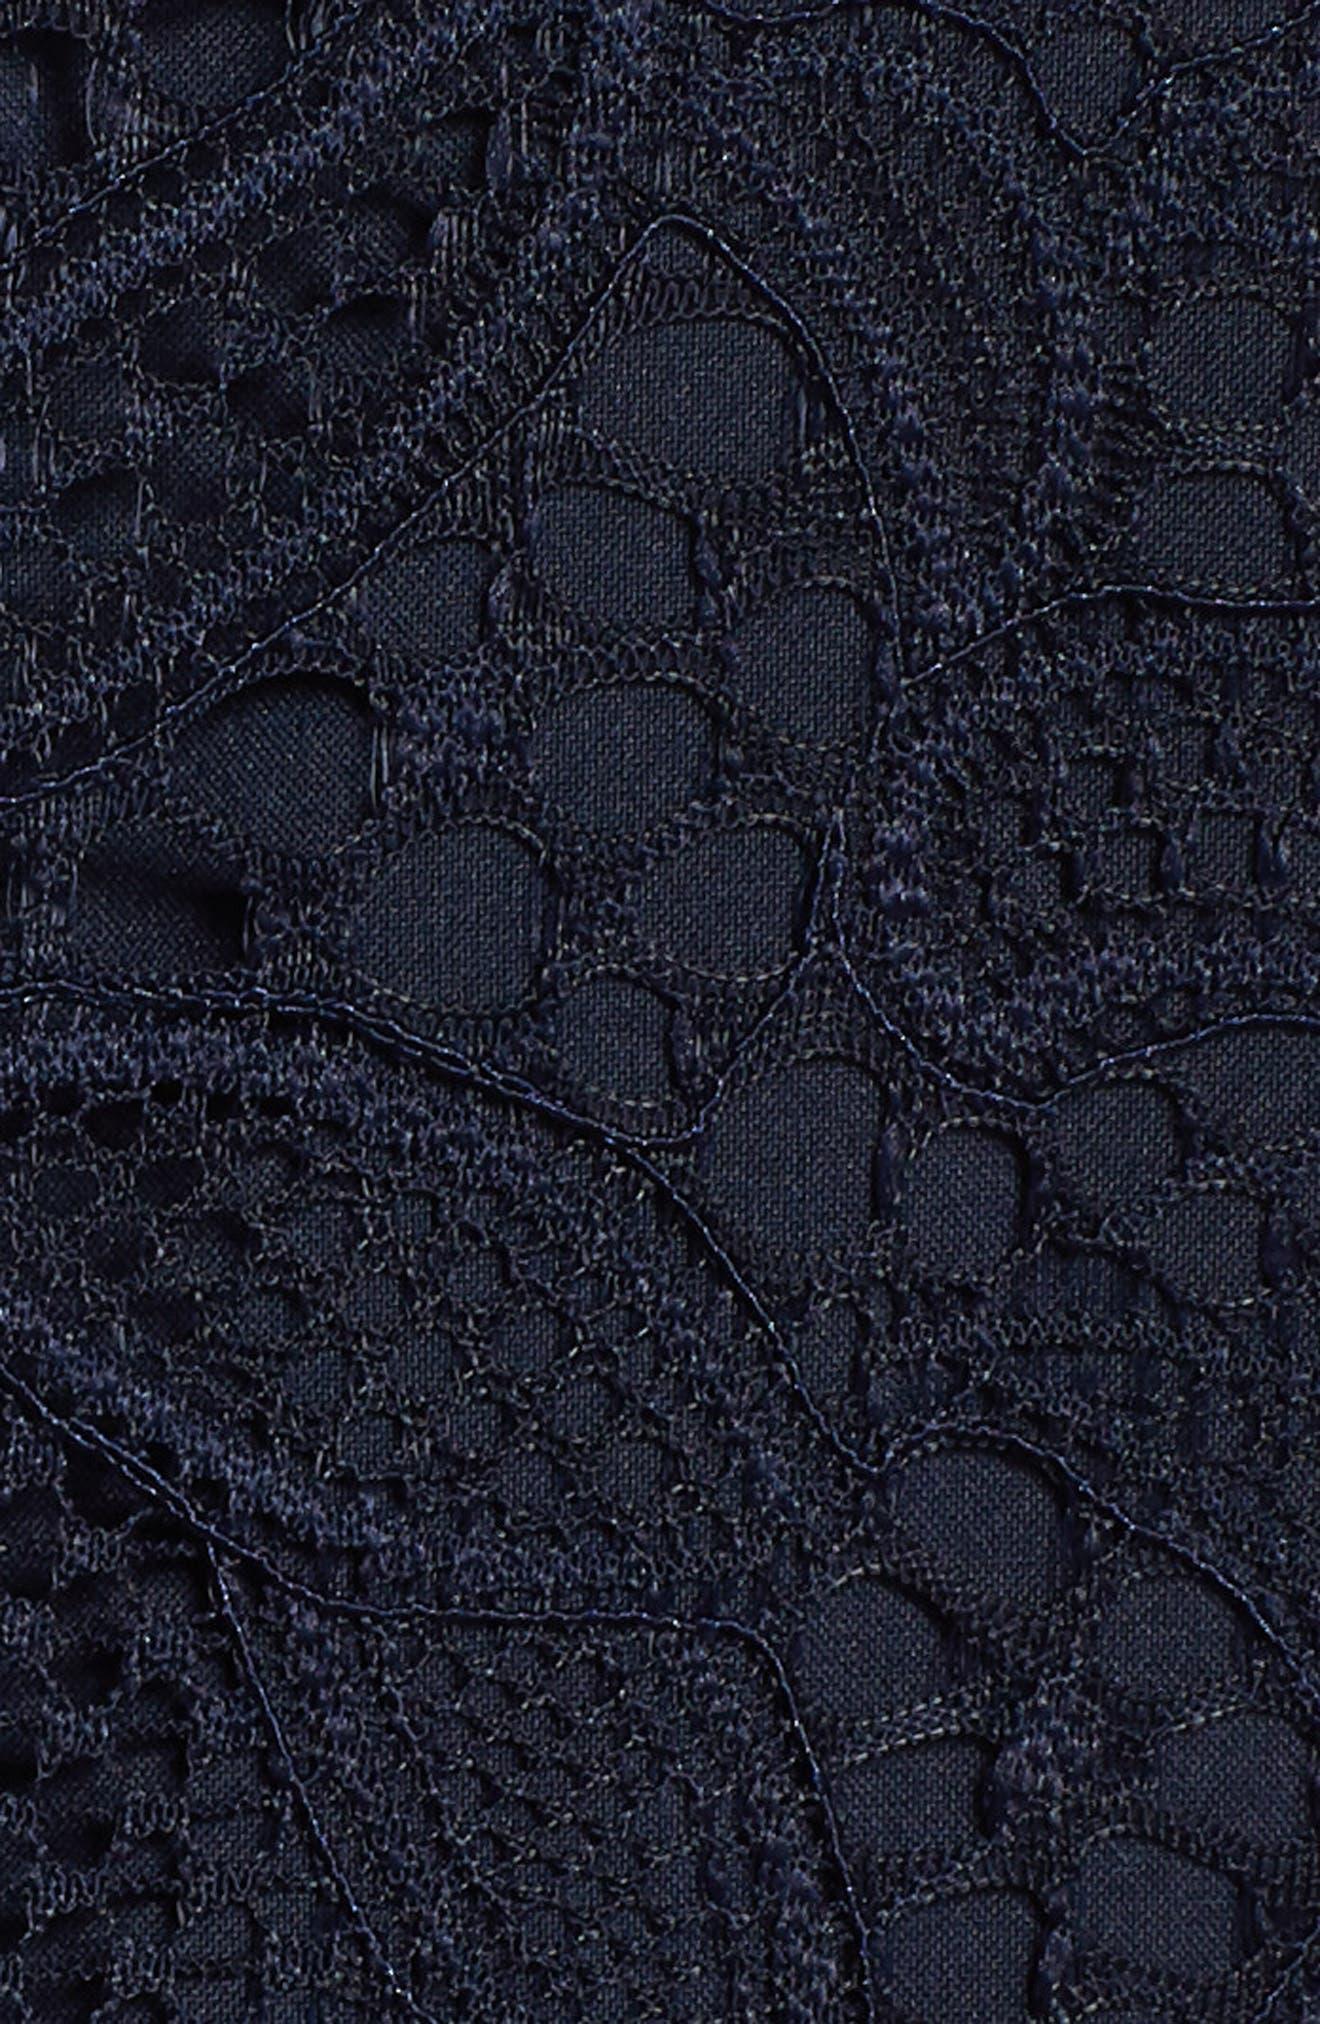 Halter Neck Lace Midi Dress,                             Alternate thumbnail 6, color,                             NAVY